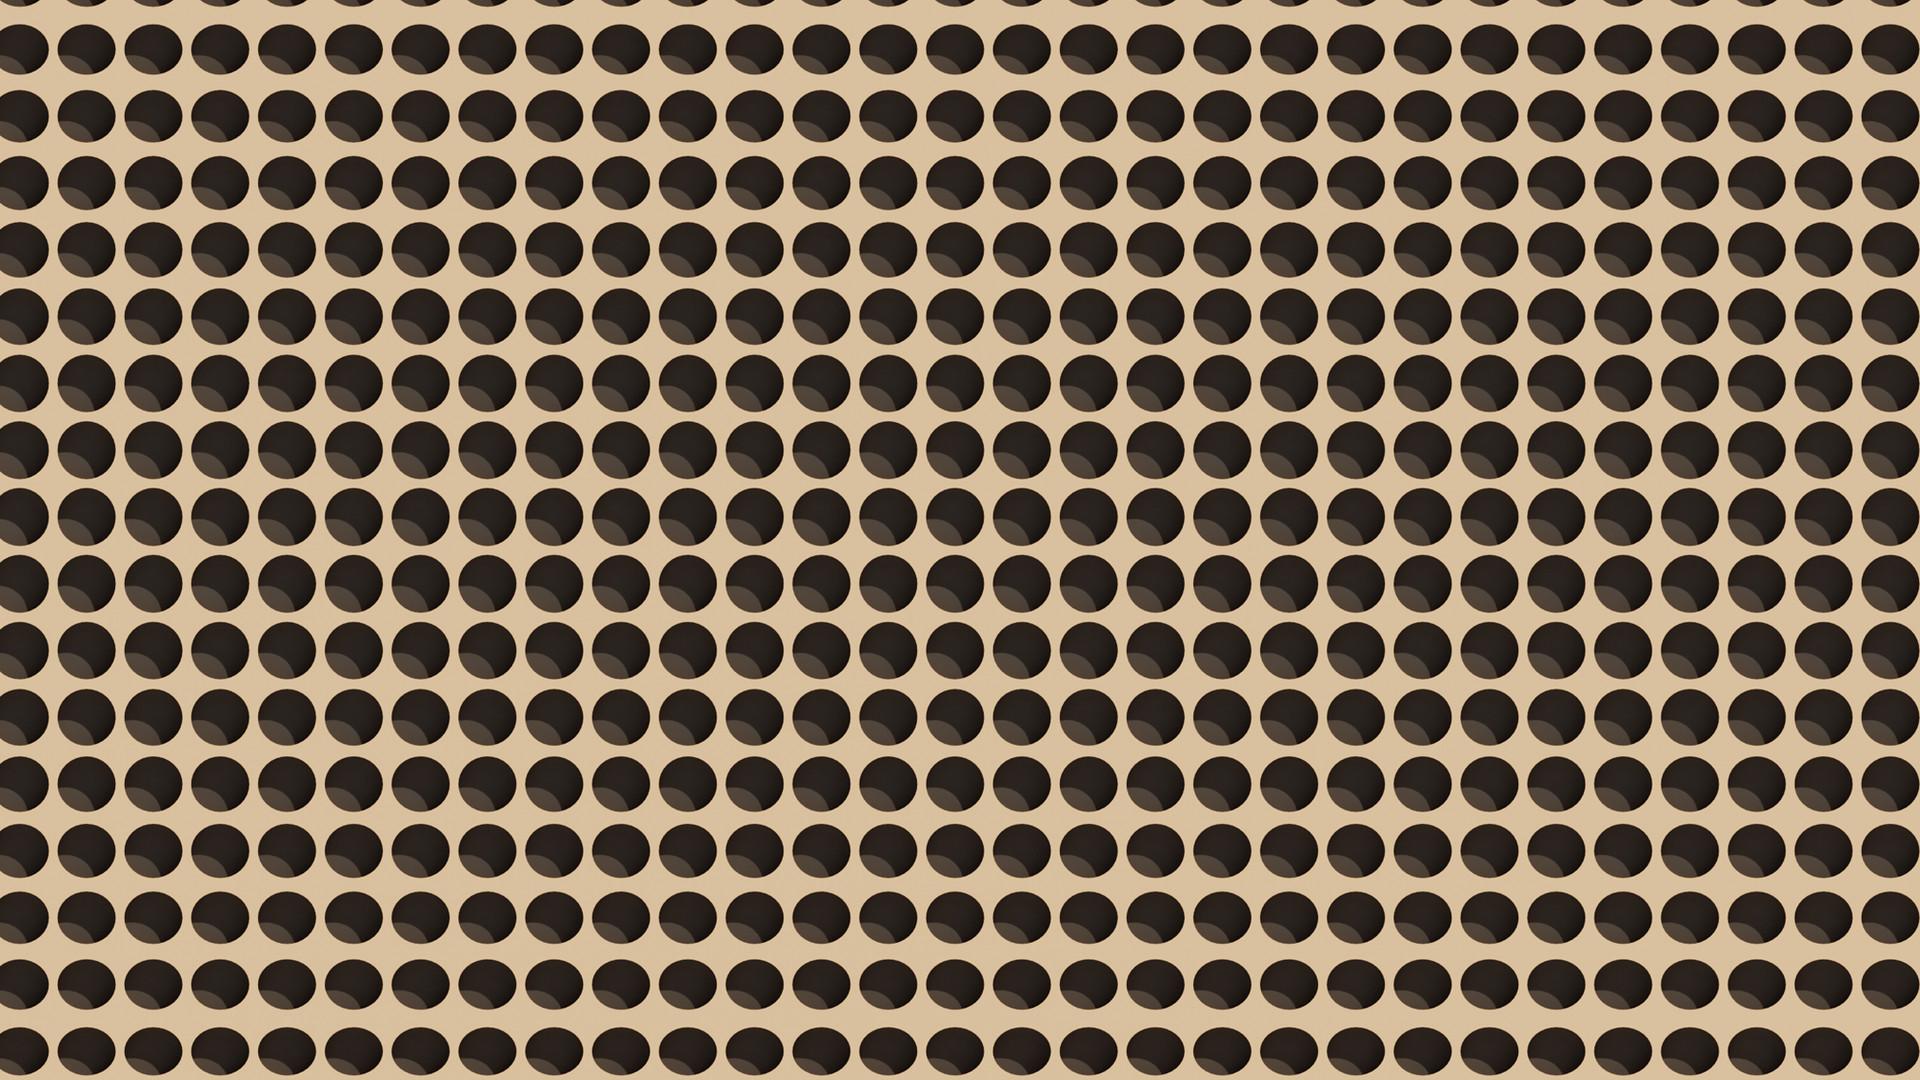 Scaled Circle Pattern